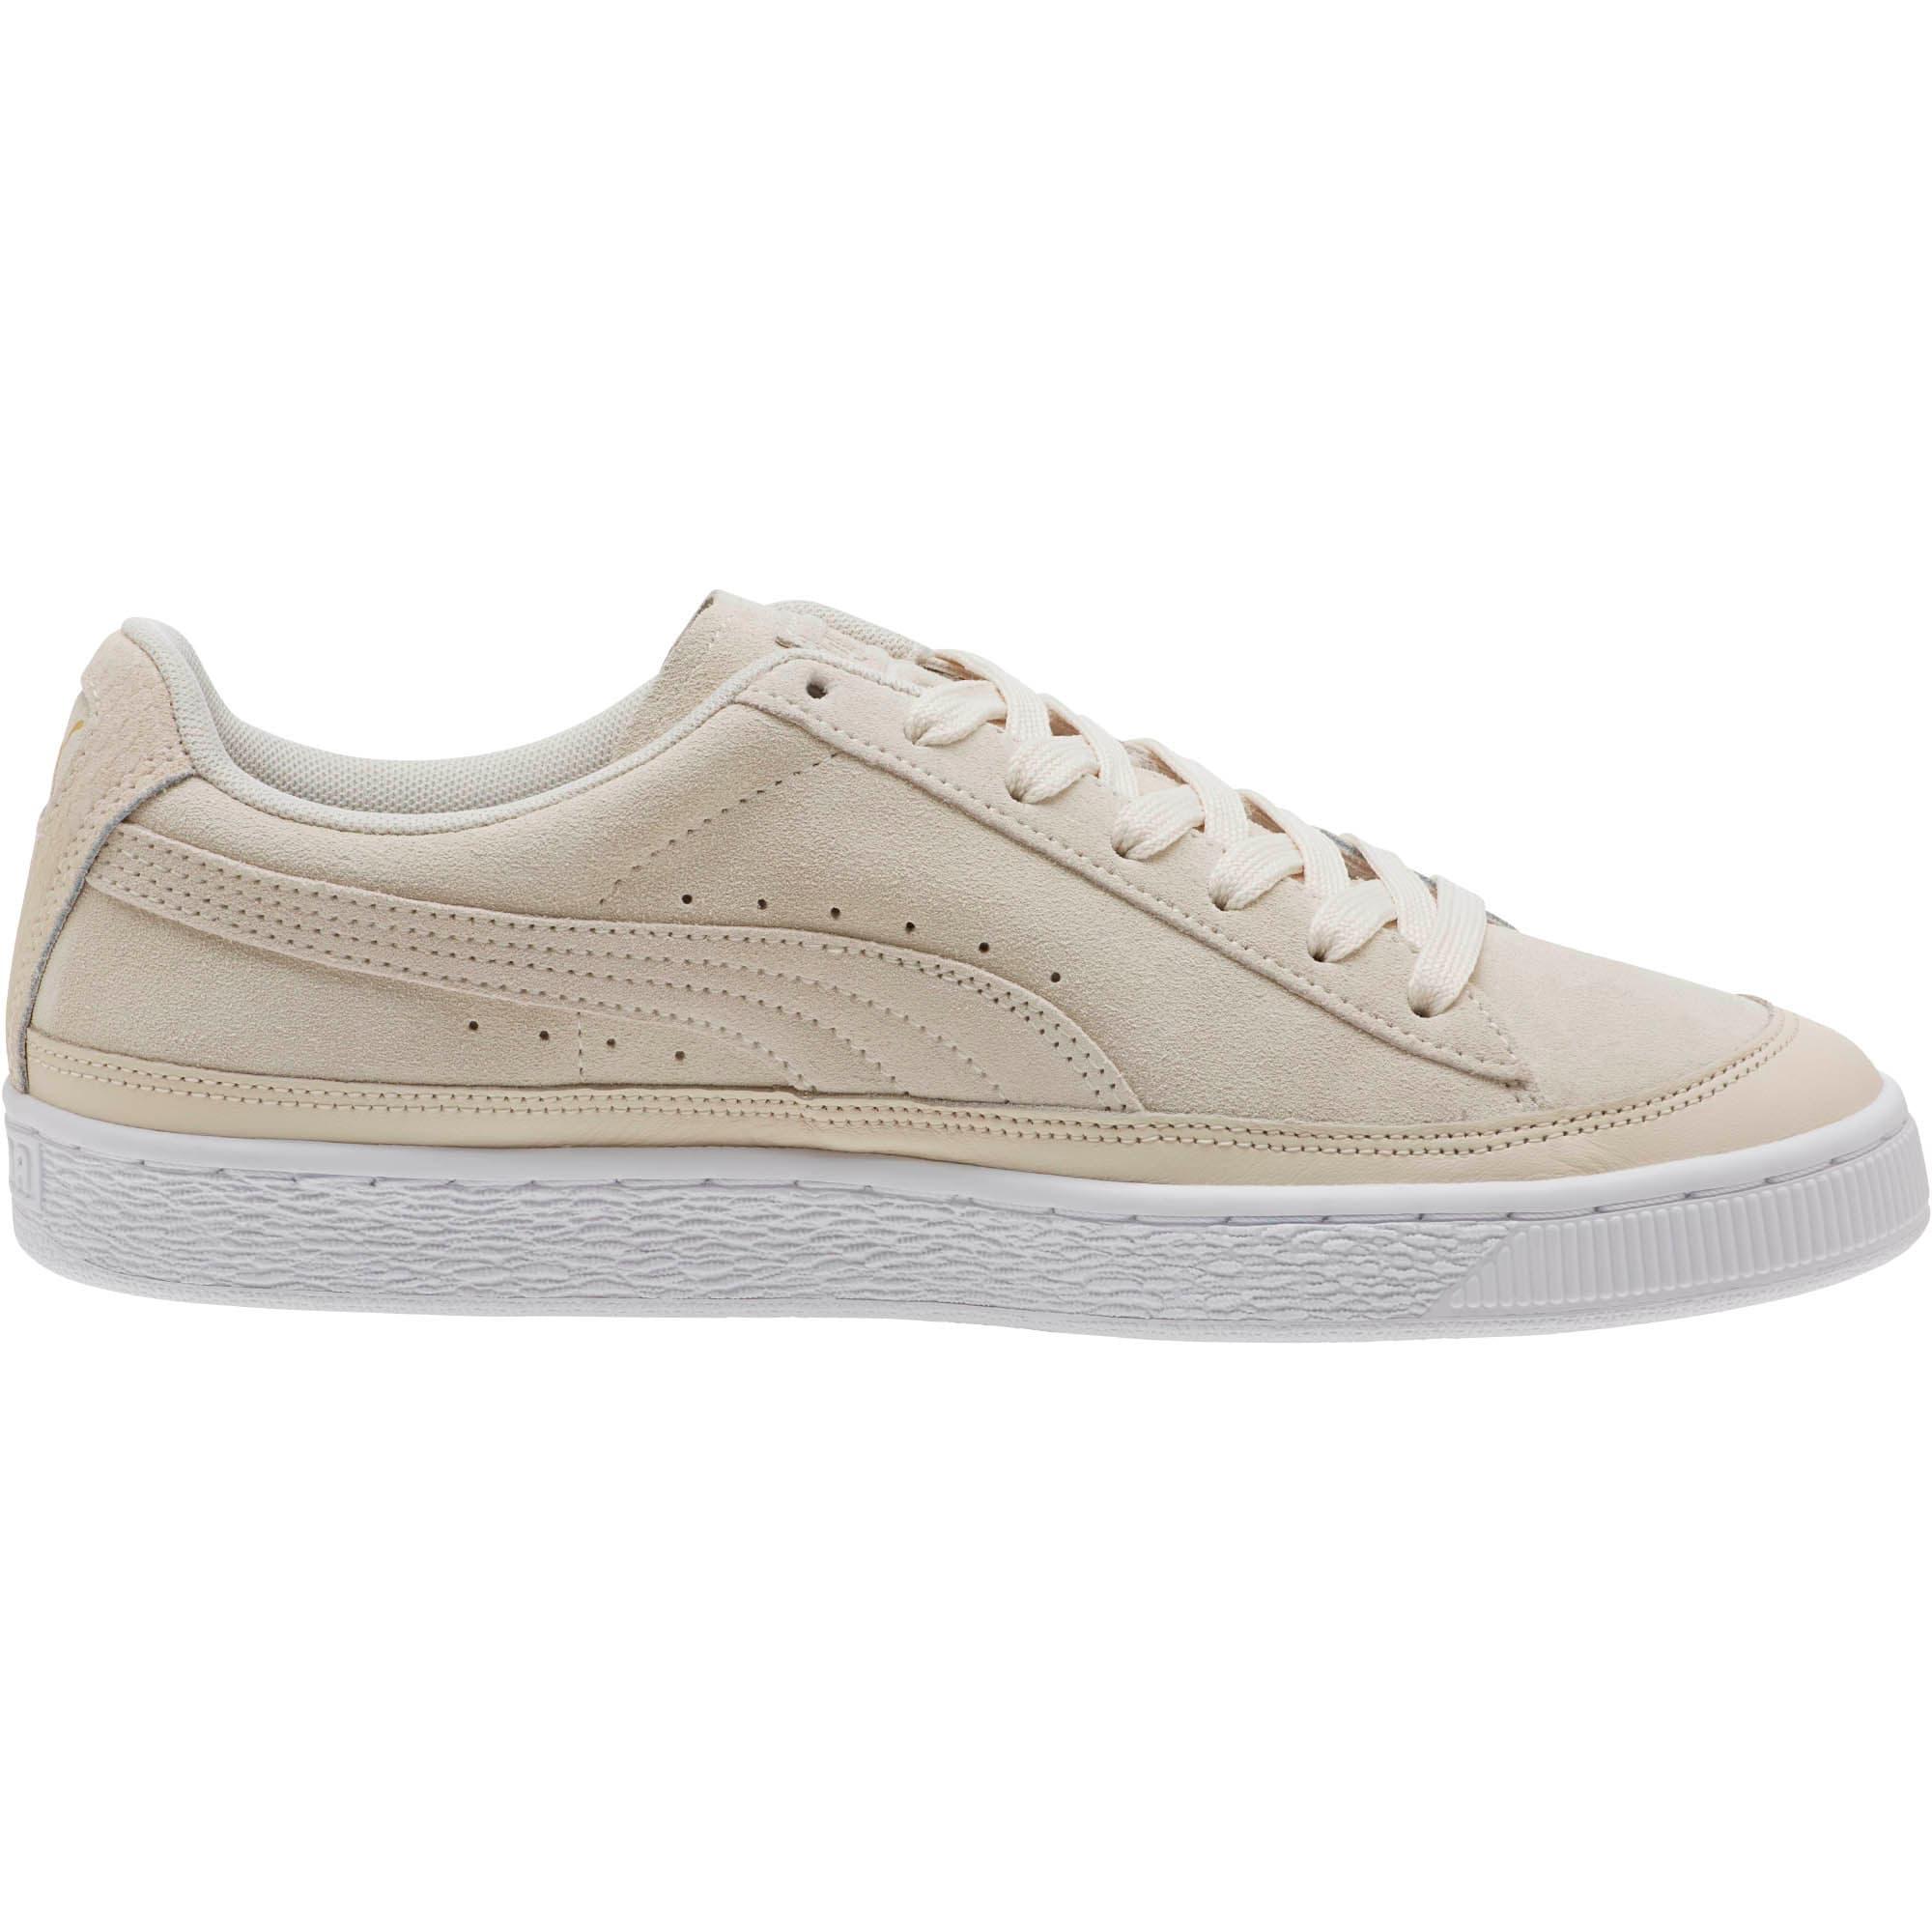 Thumbnail 3 of Suede Skate Premium Sneakers, Whisper White-Puma White, medium